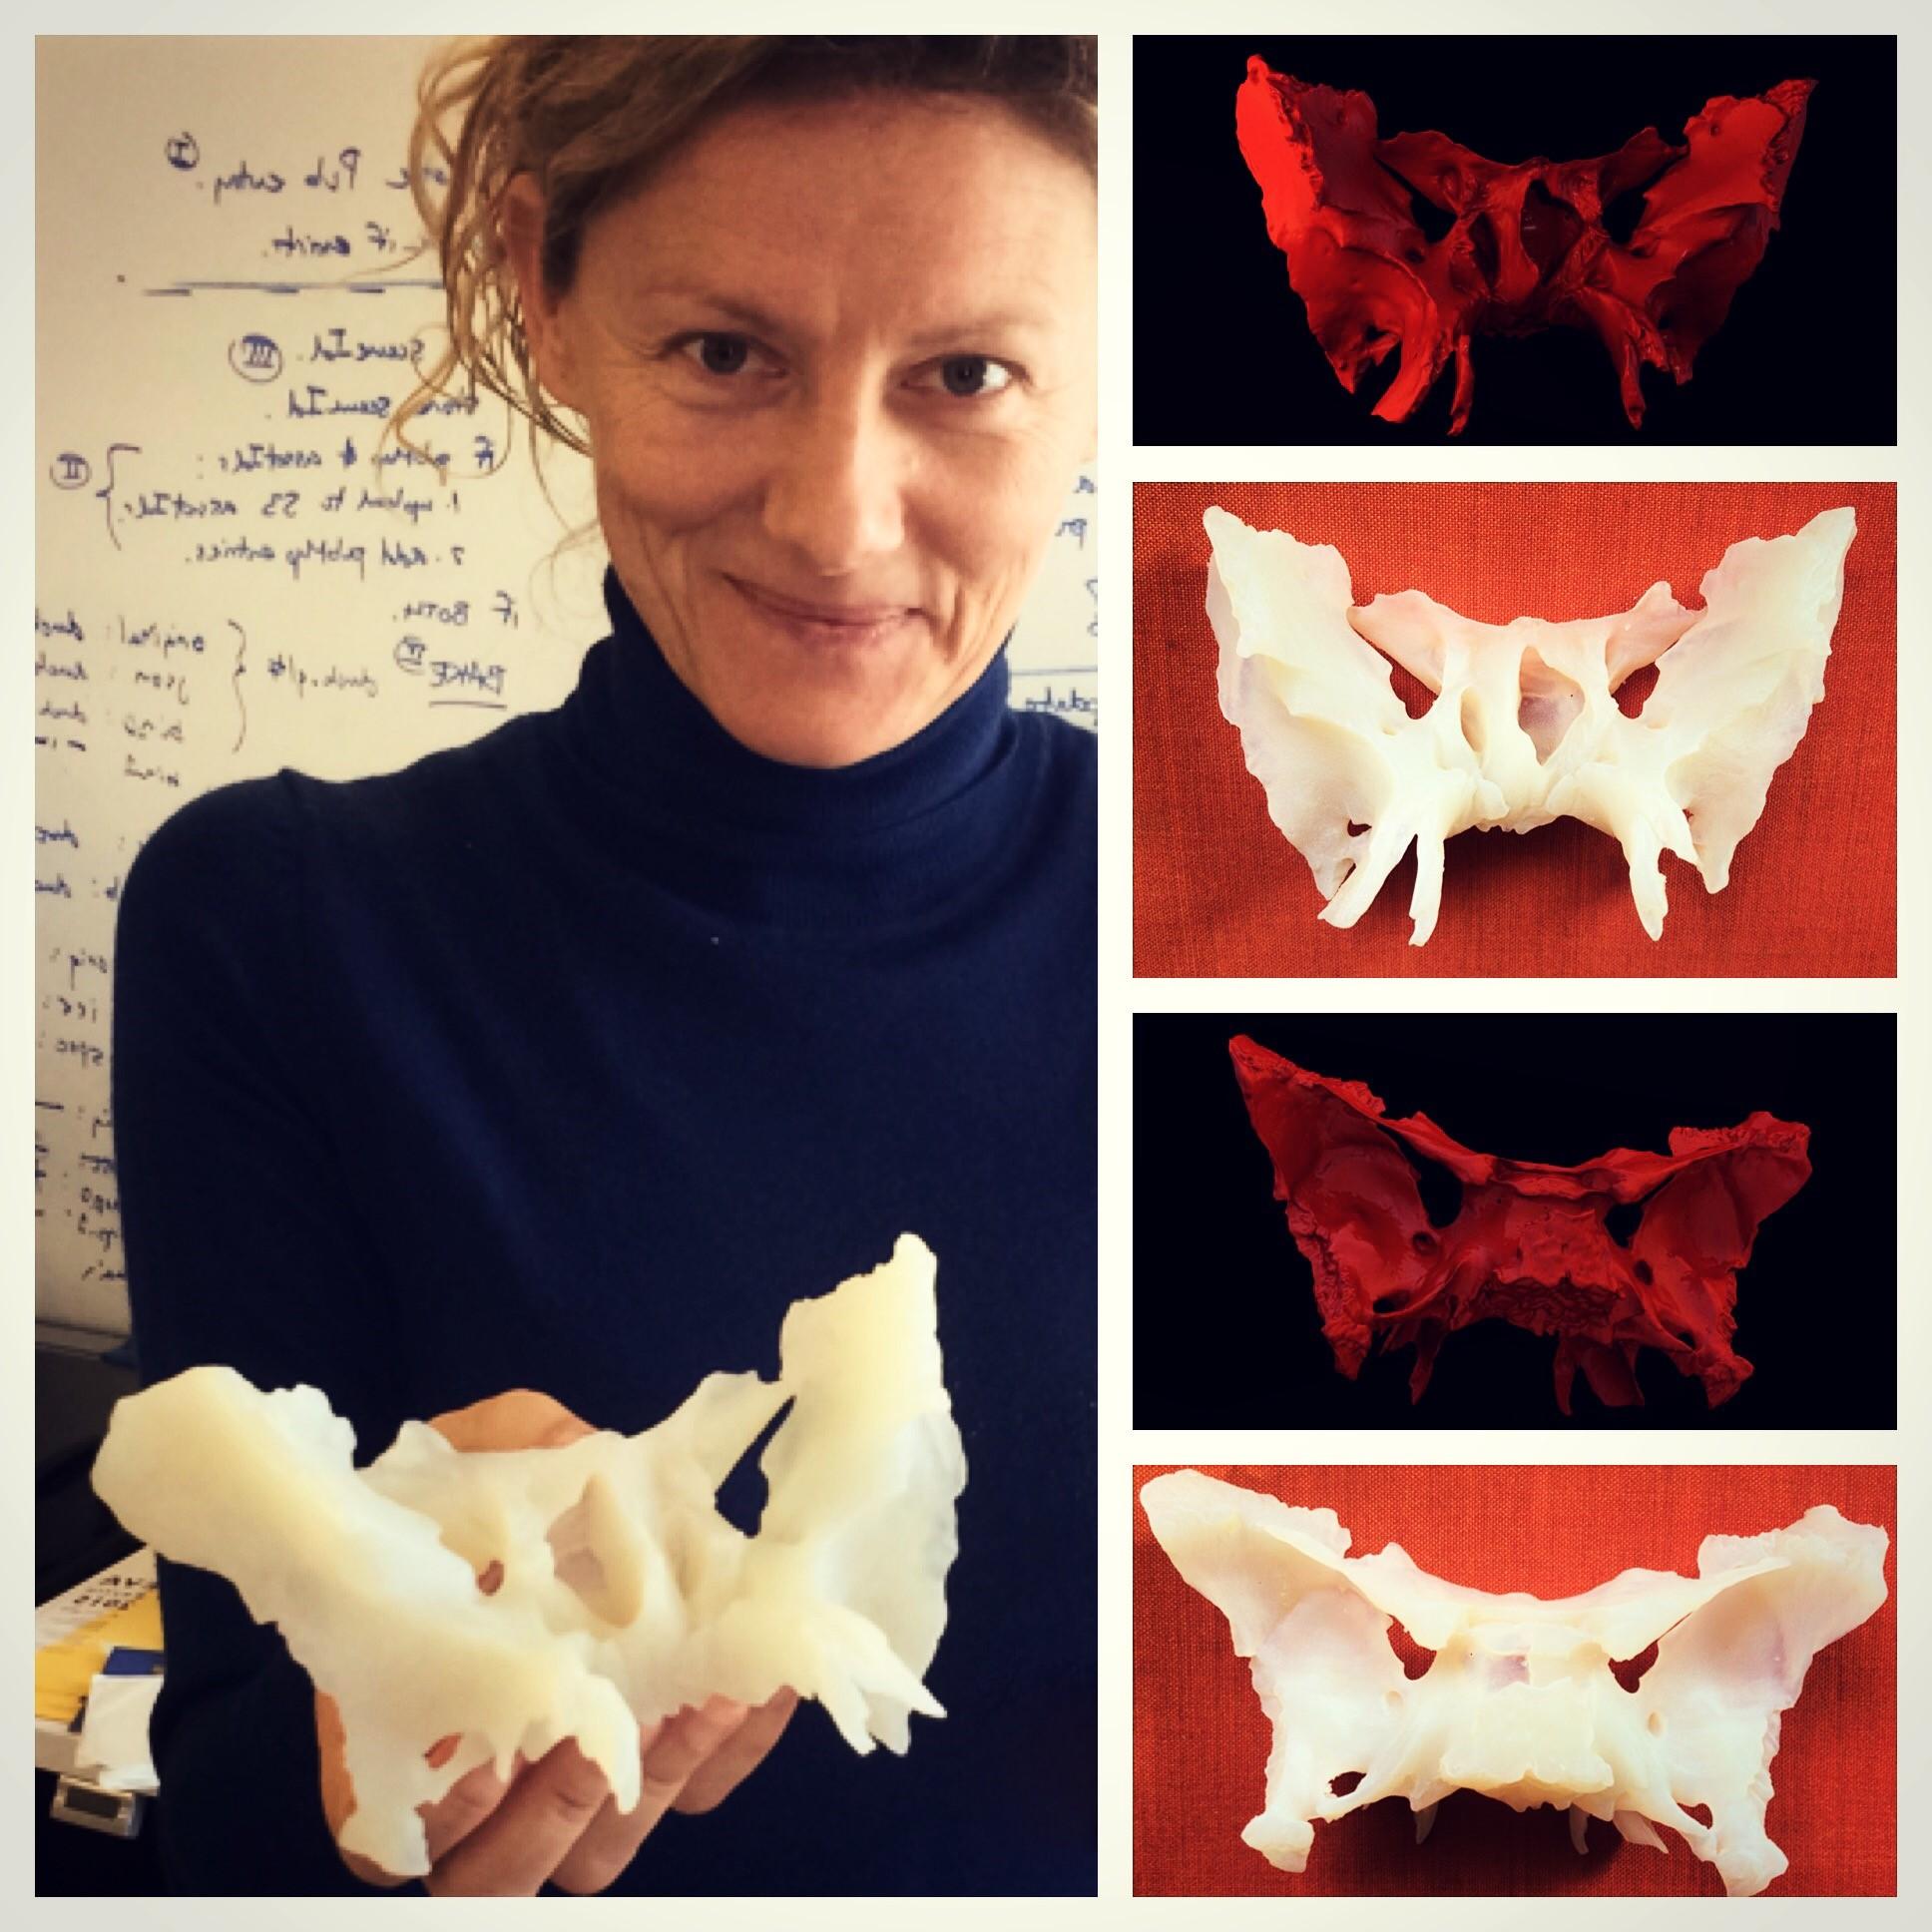 Fig: The Reconstruction of the Sphenoid Bone and its 3D Print made by Tatjana Dzambazova